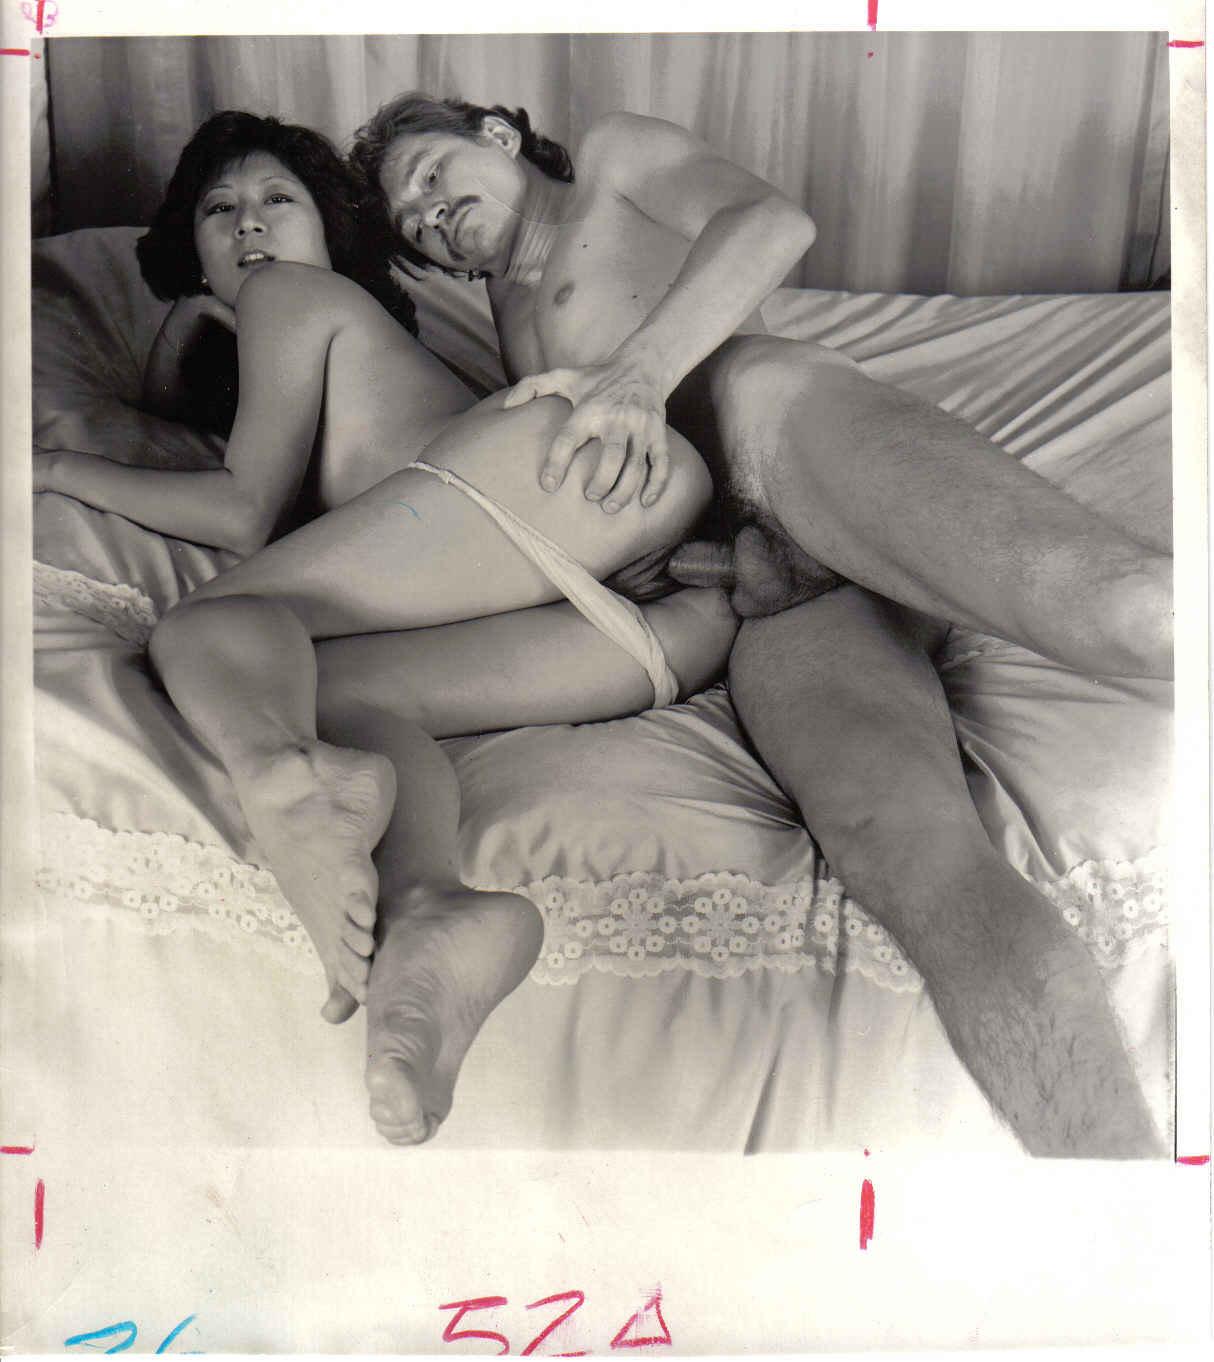 porno18let.ru — Фото секс винтаж